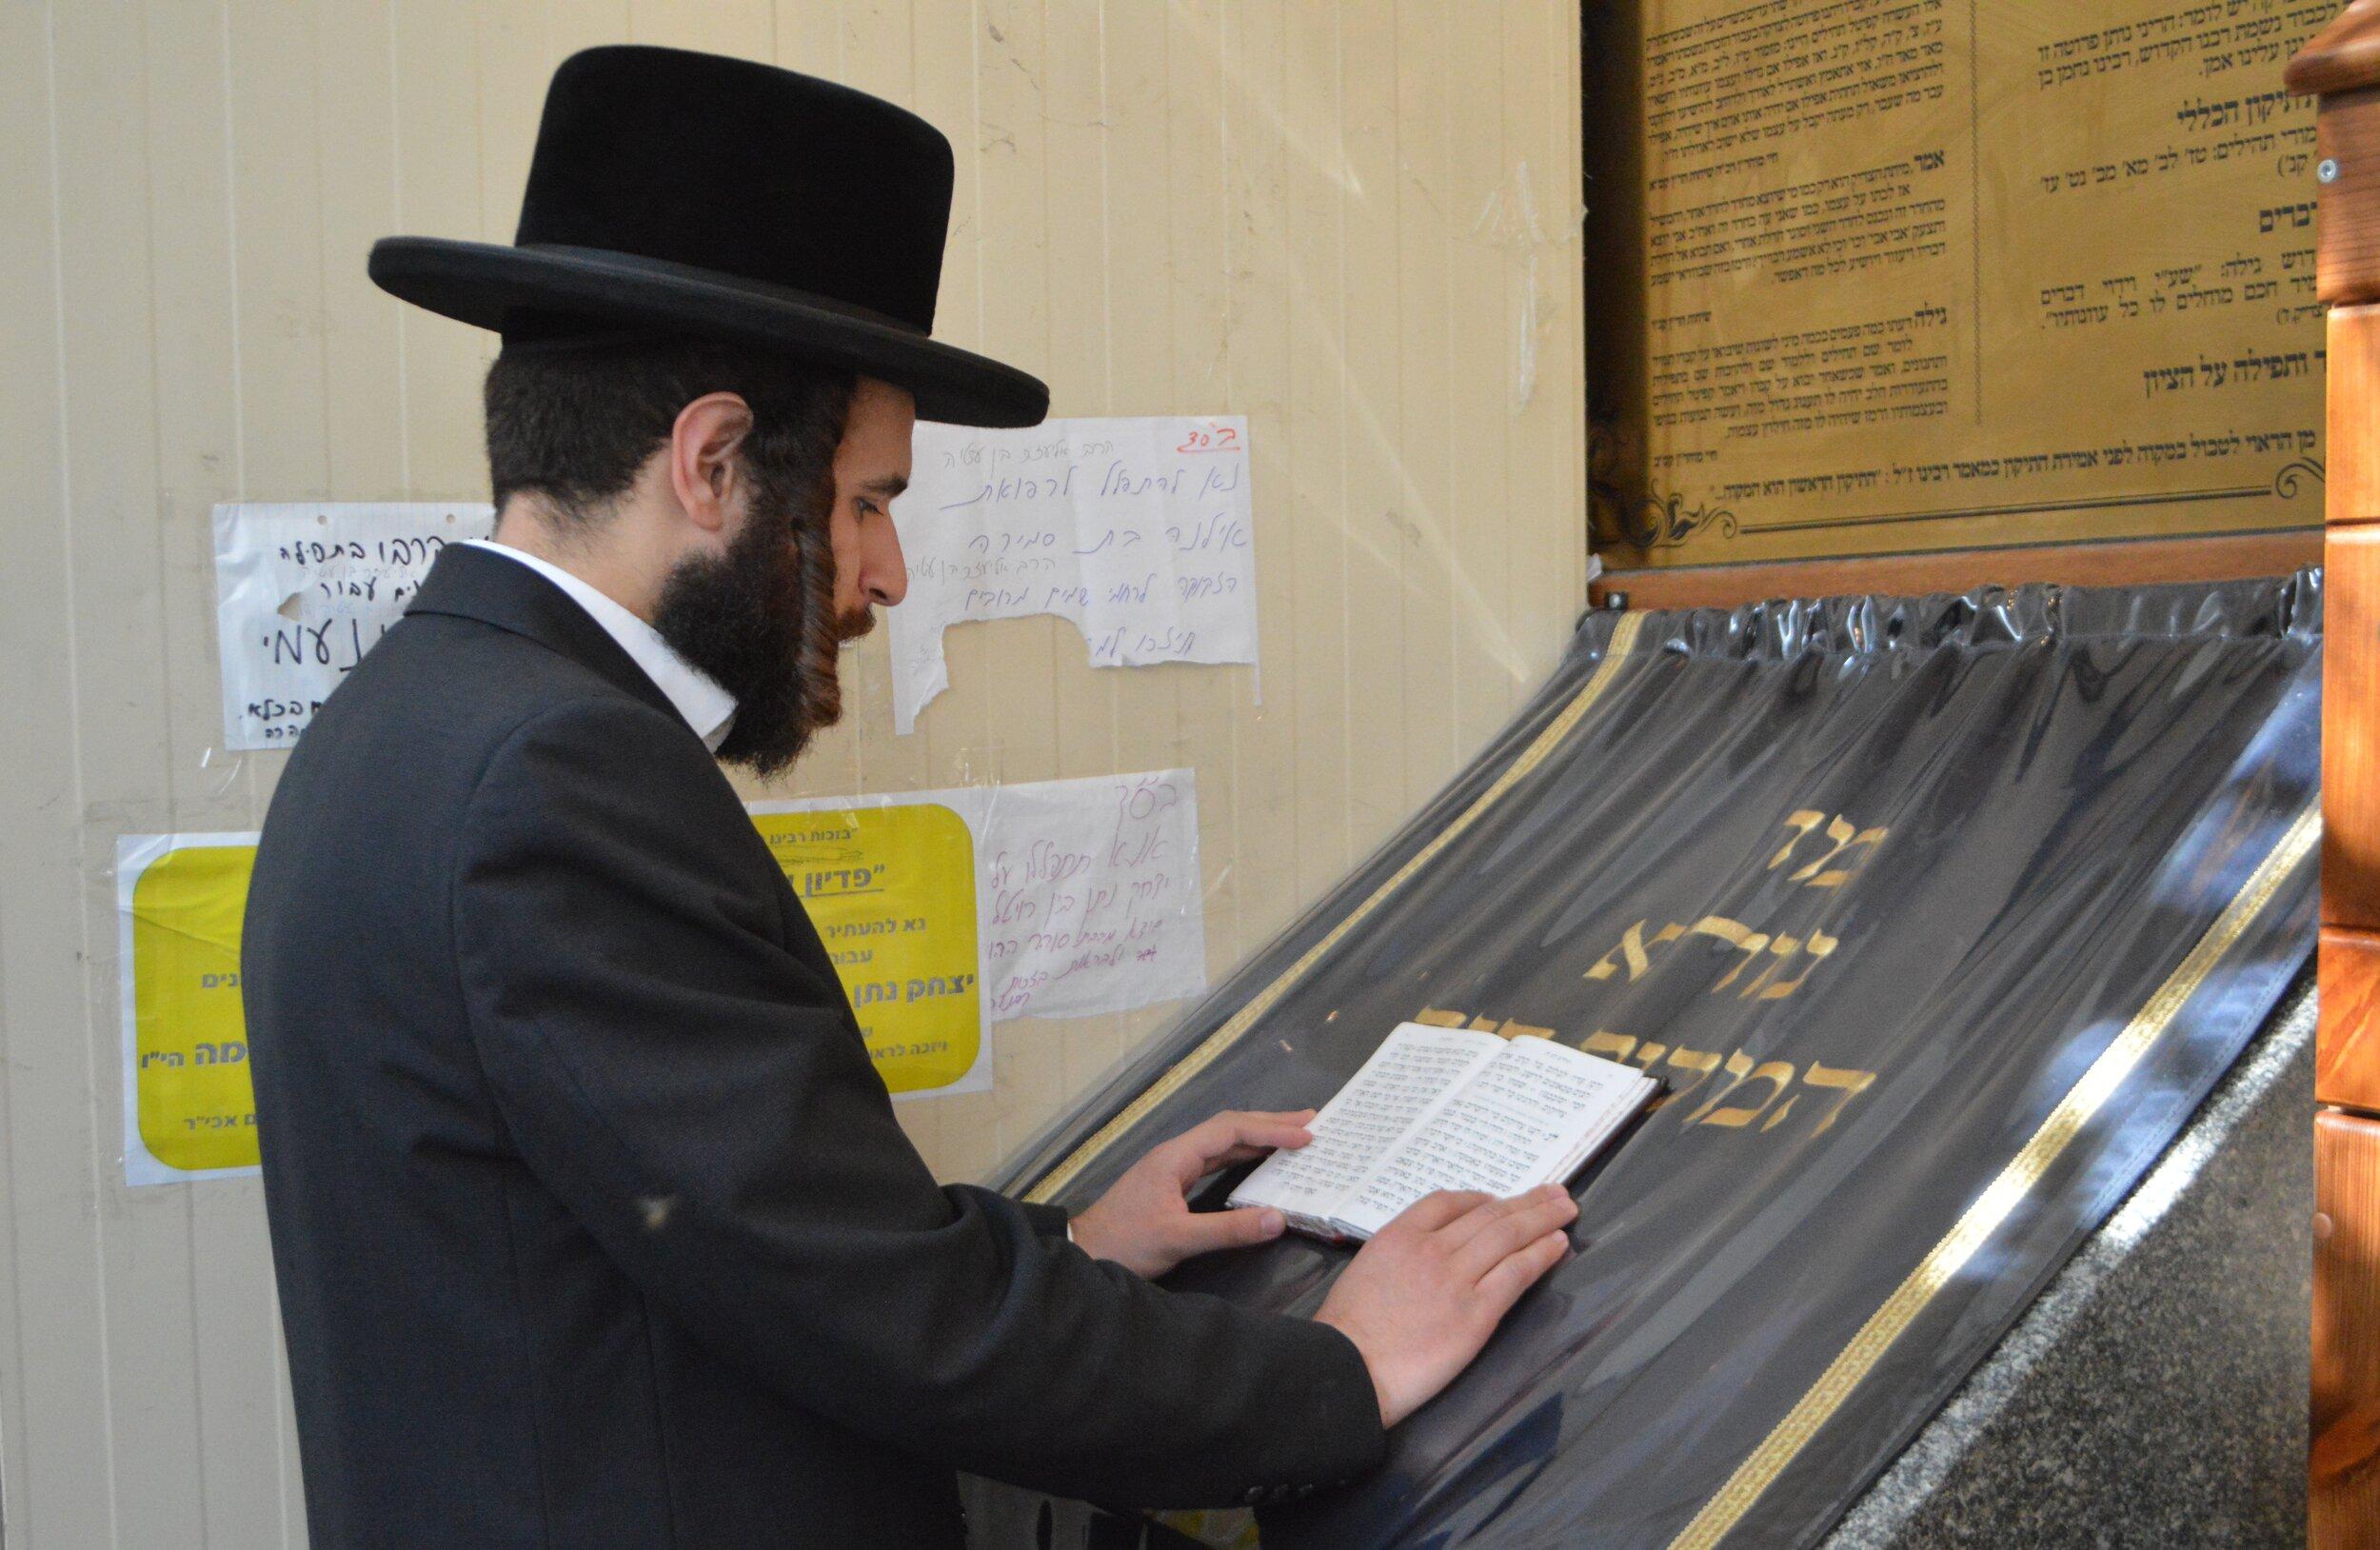 Josef Chaim prays at the site of Rabbi Nachman's grave in Uman, Ukraine. Photo by Paul Brian.